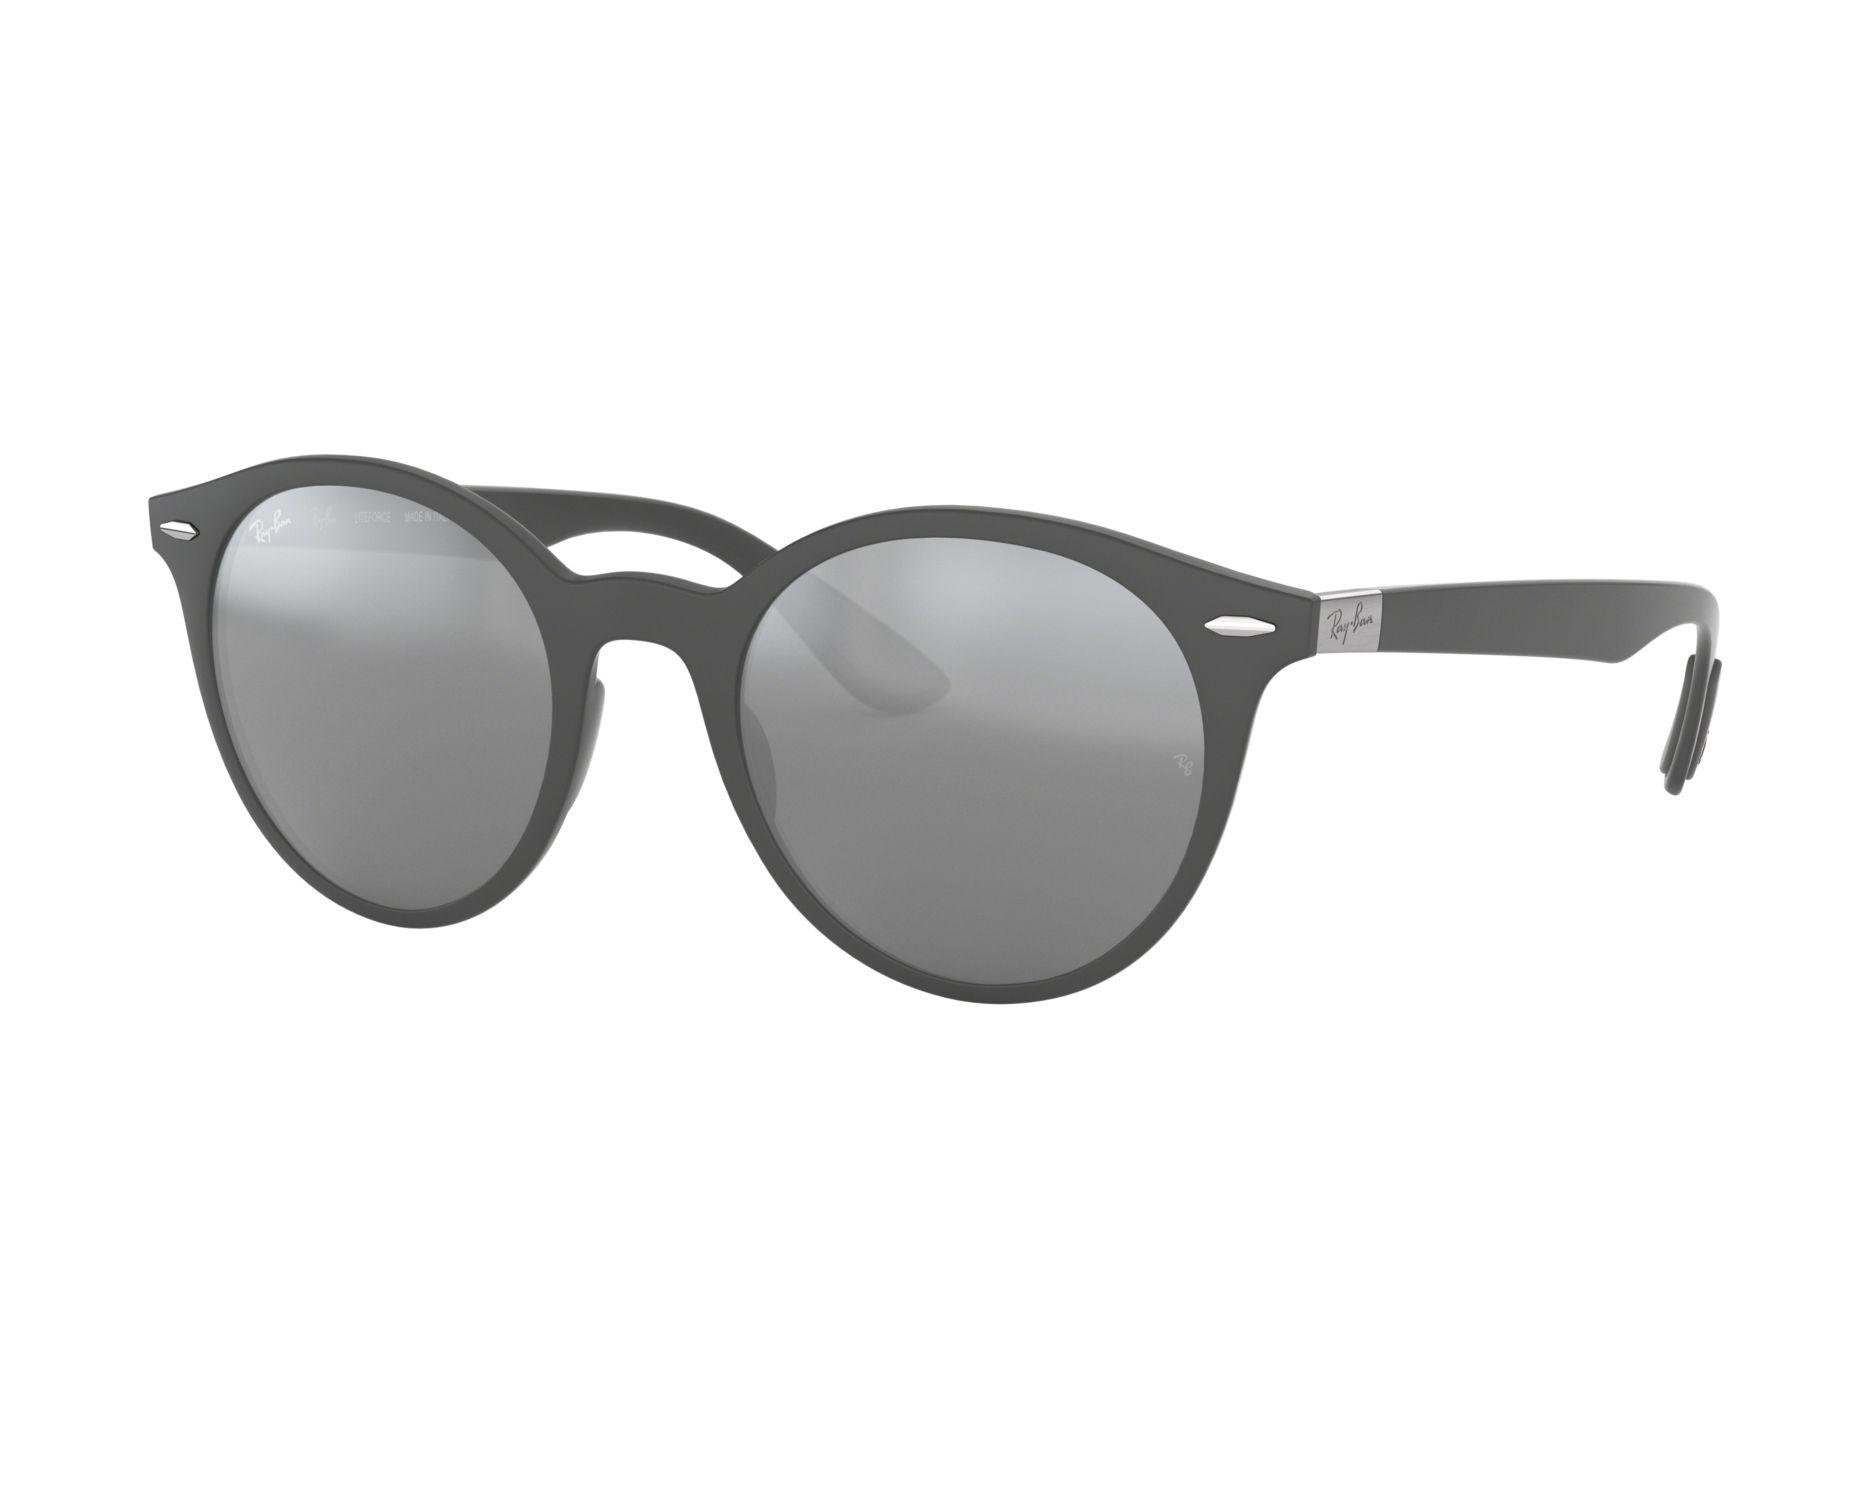 fefb5ce82f Sunglasses Ray-Ban RB-4296 633288 51-21 Grey